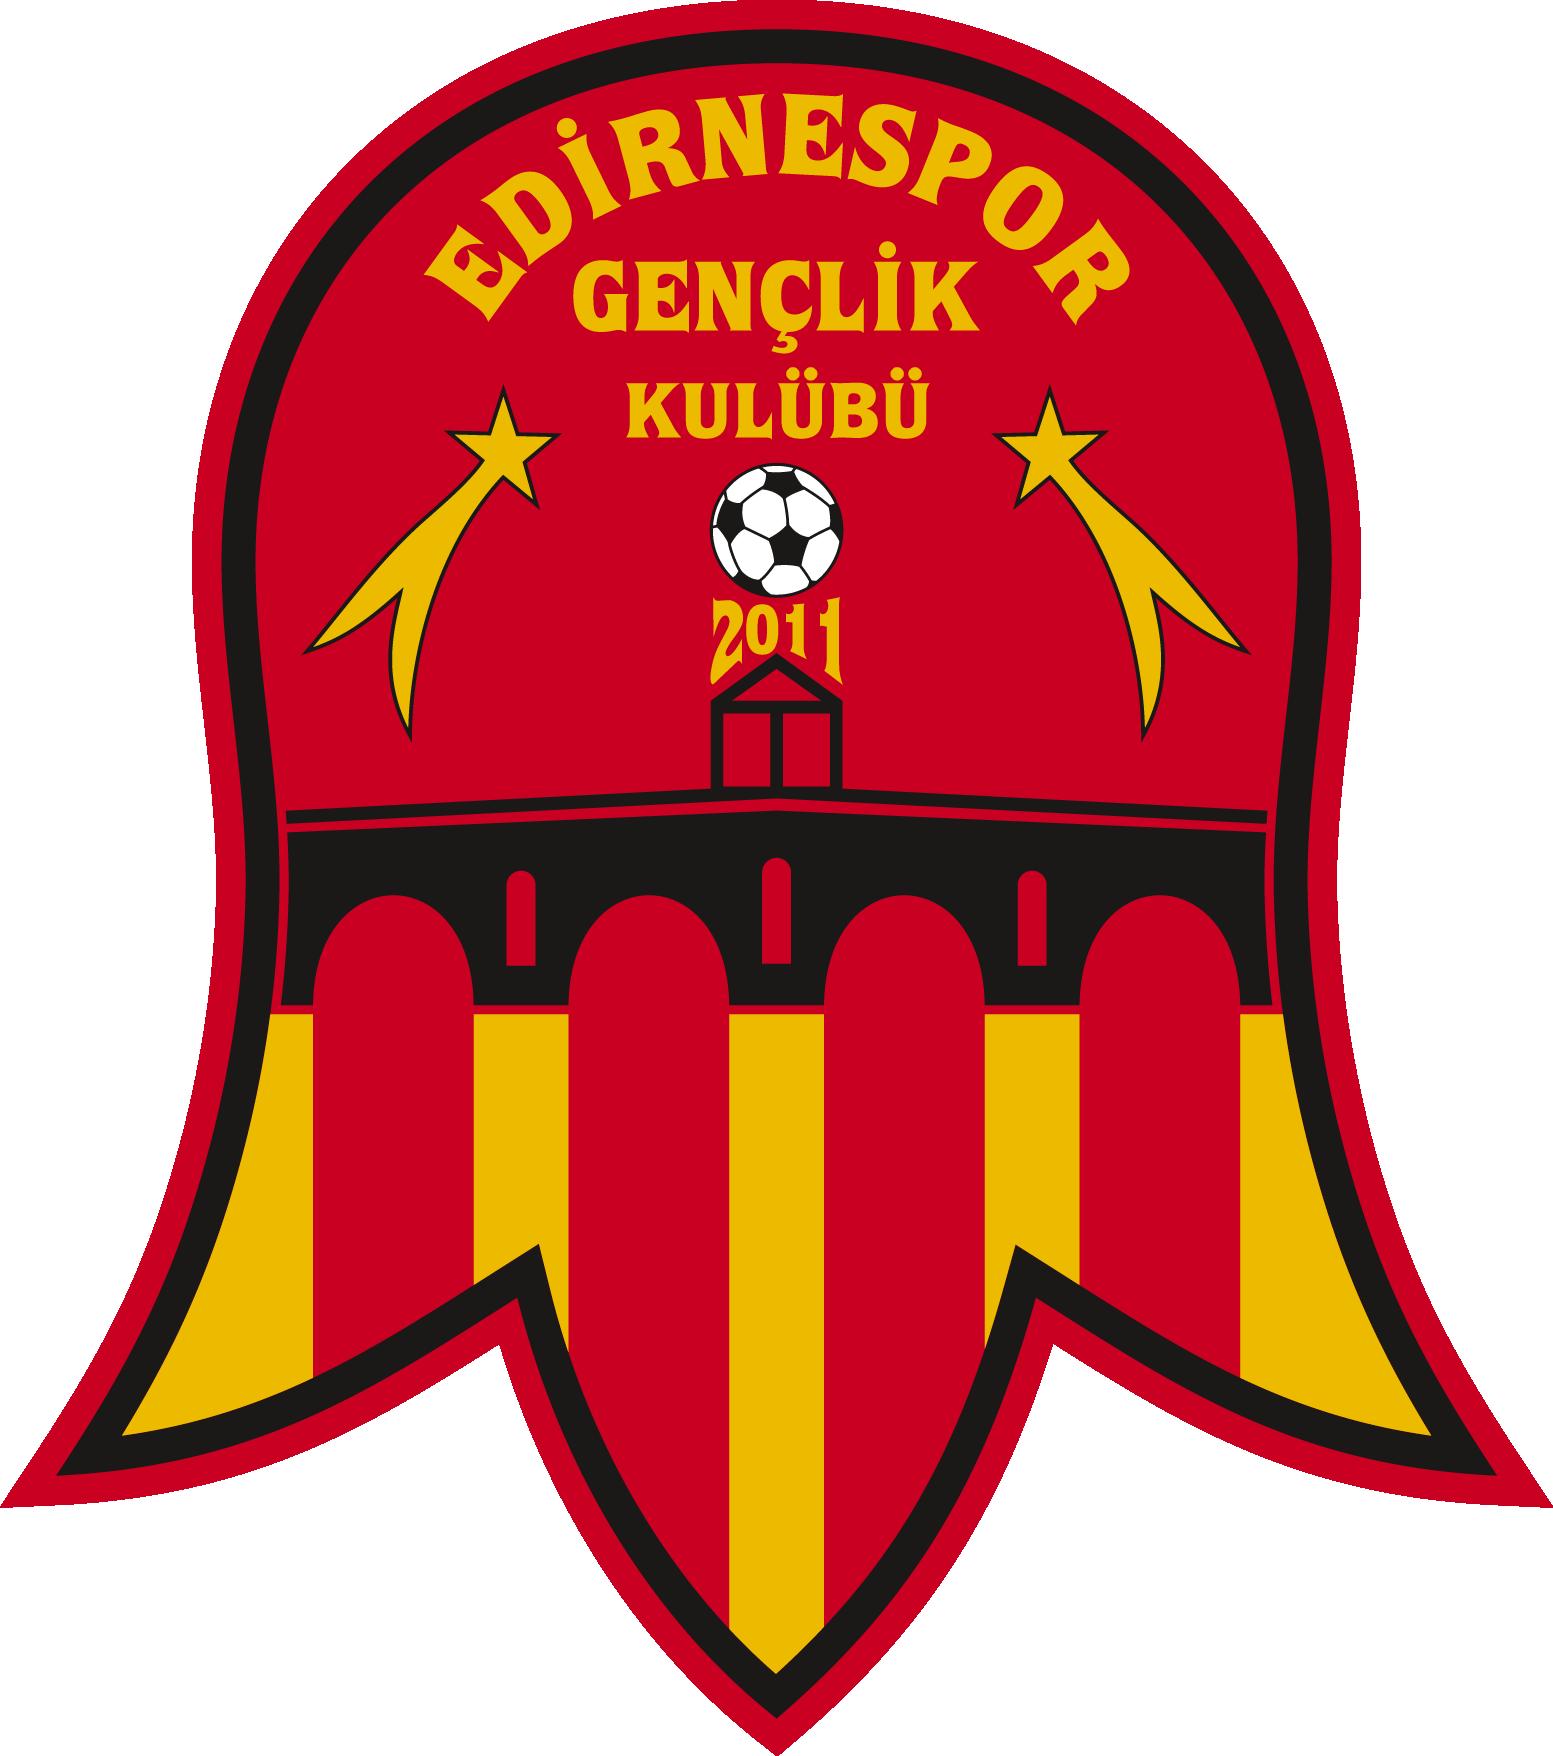 Edirnespor Genclik logo